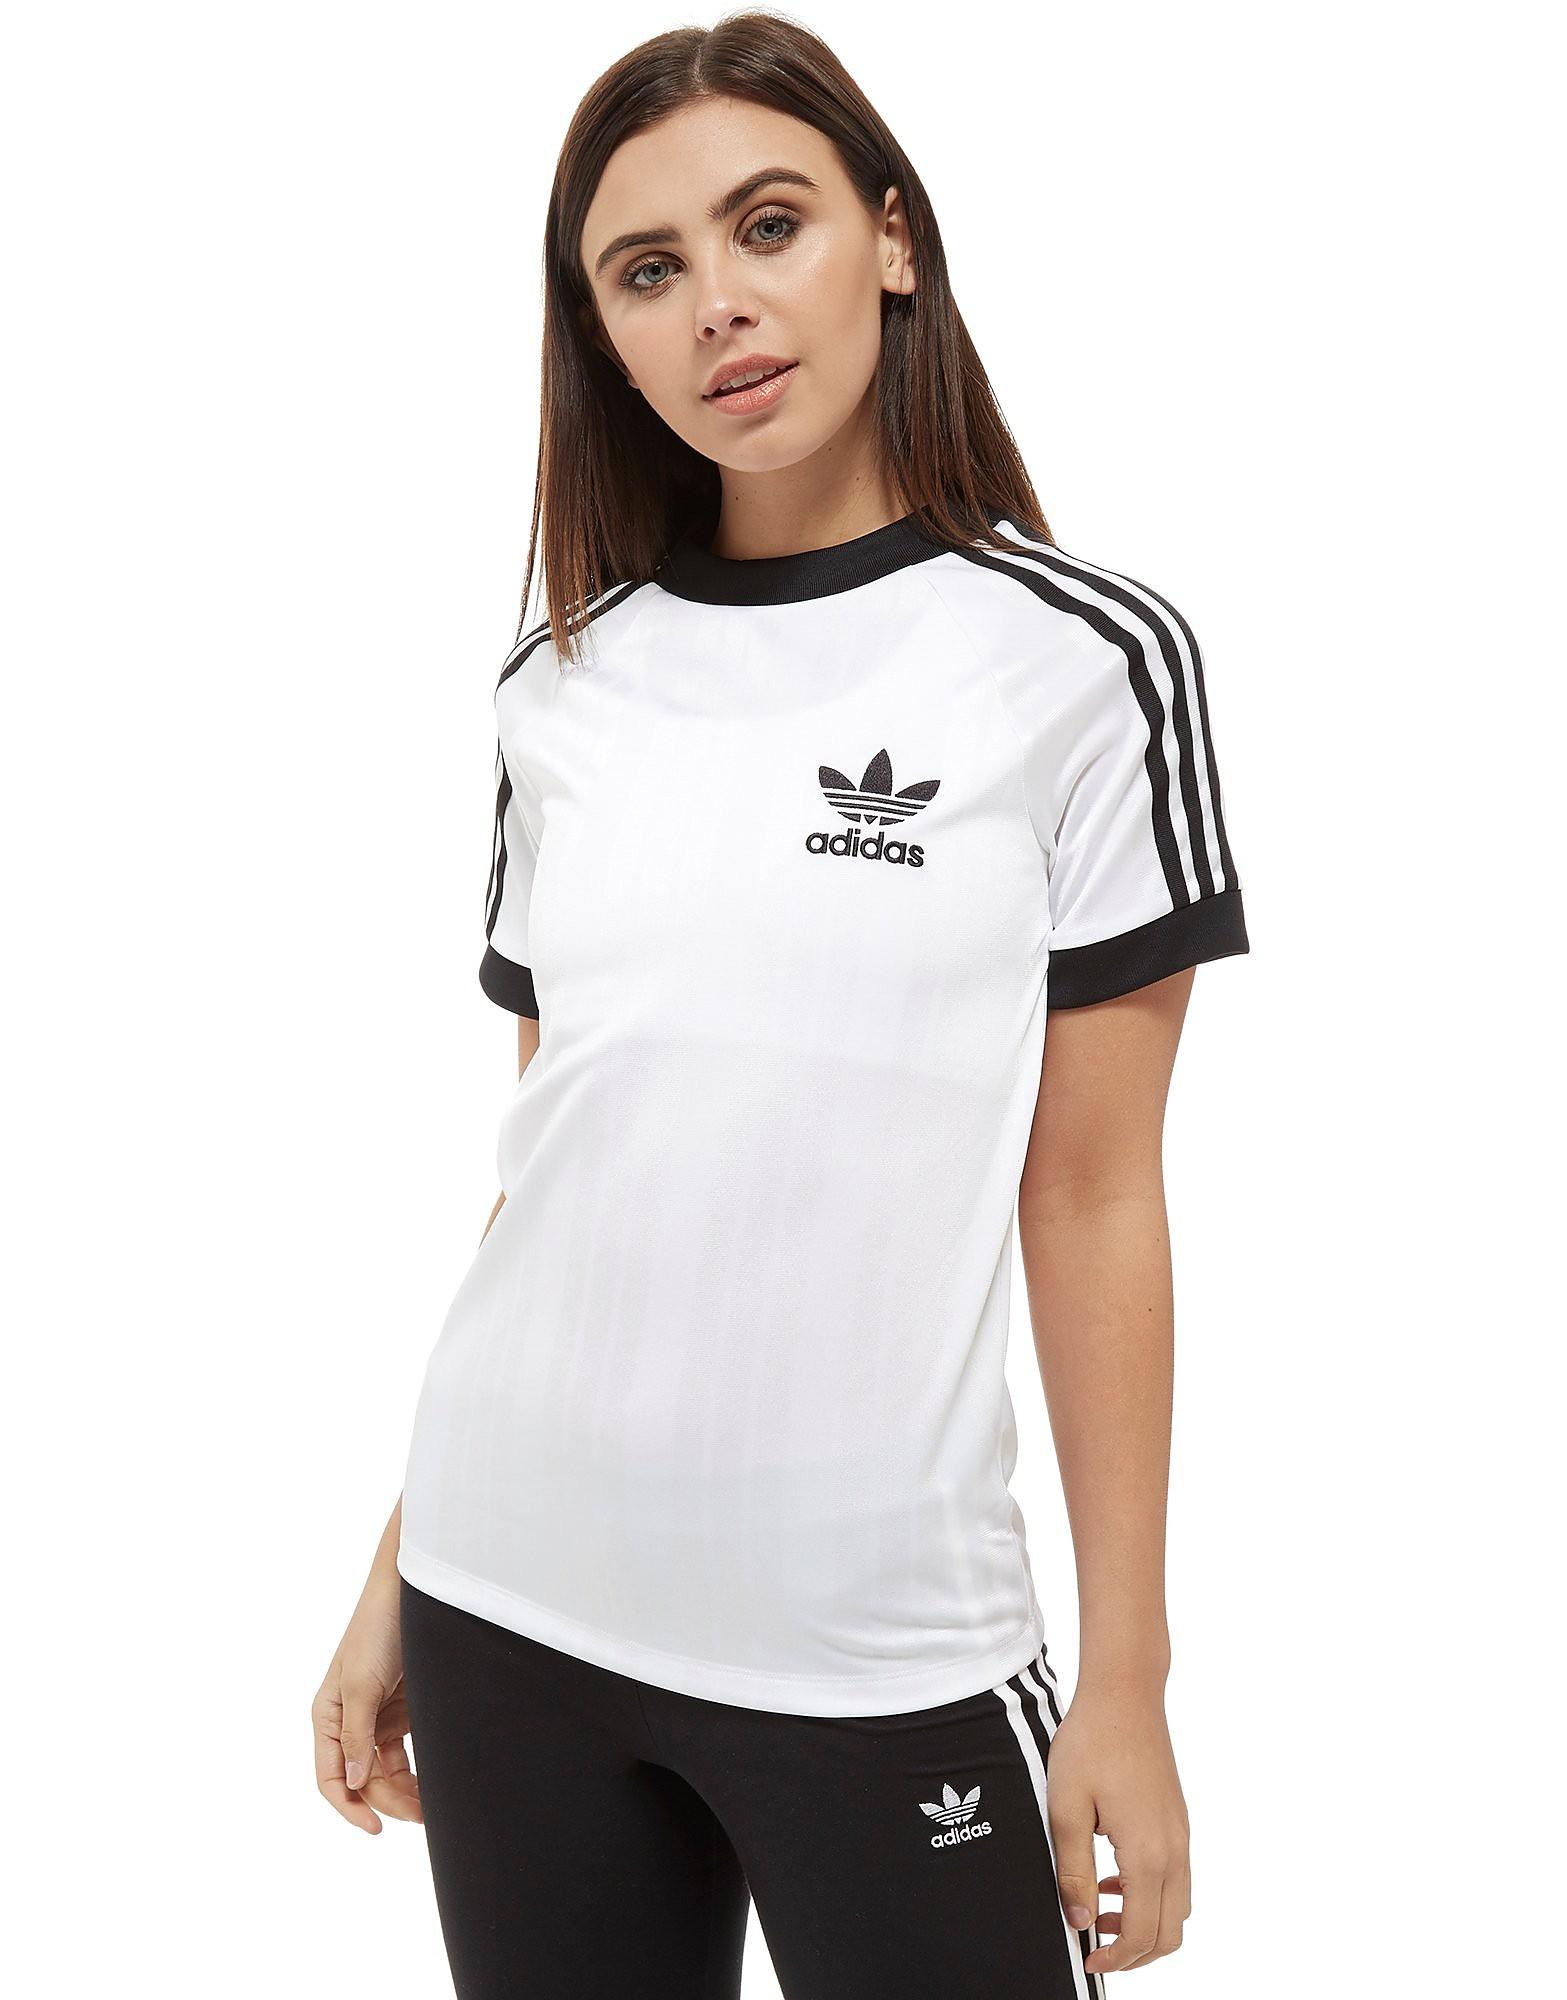 adidas Originals California Football T-Shirt